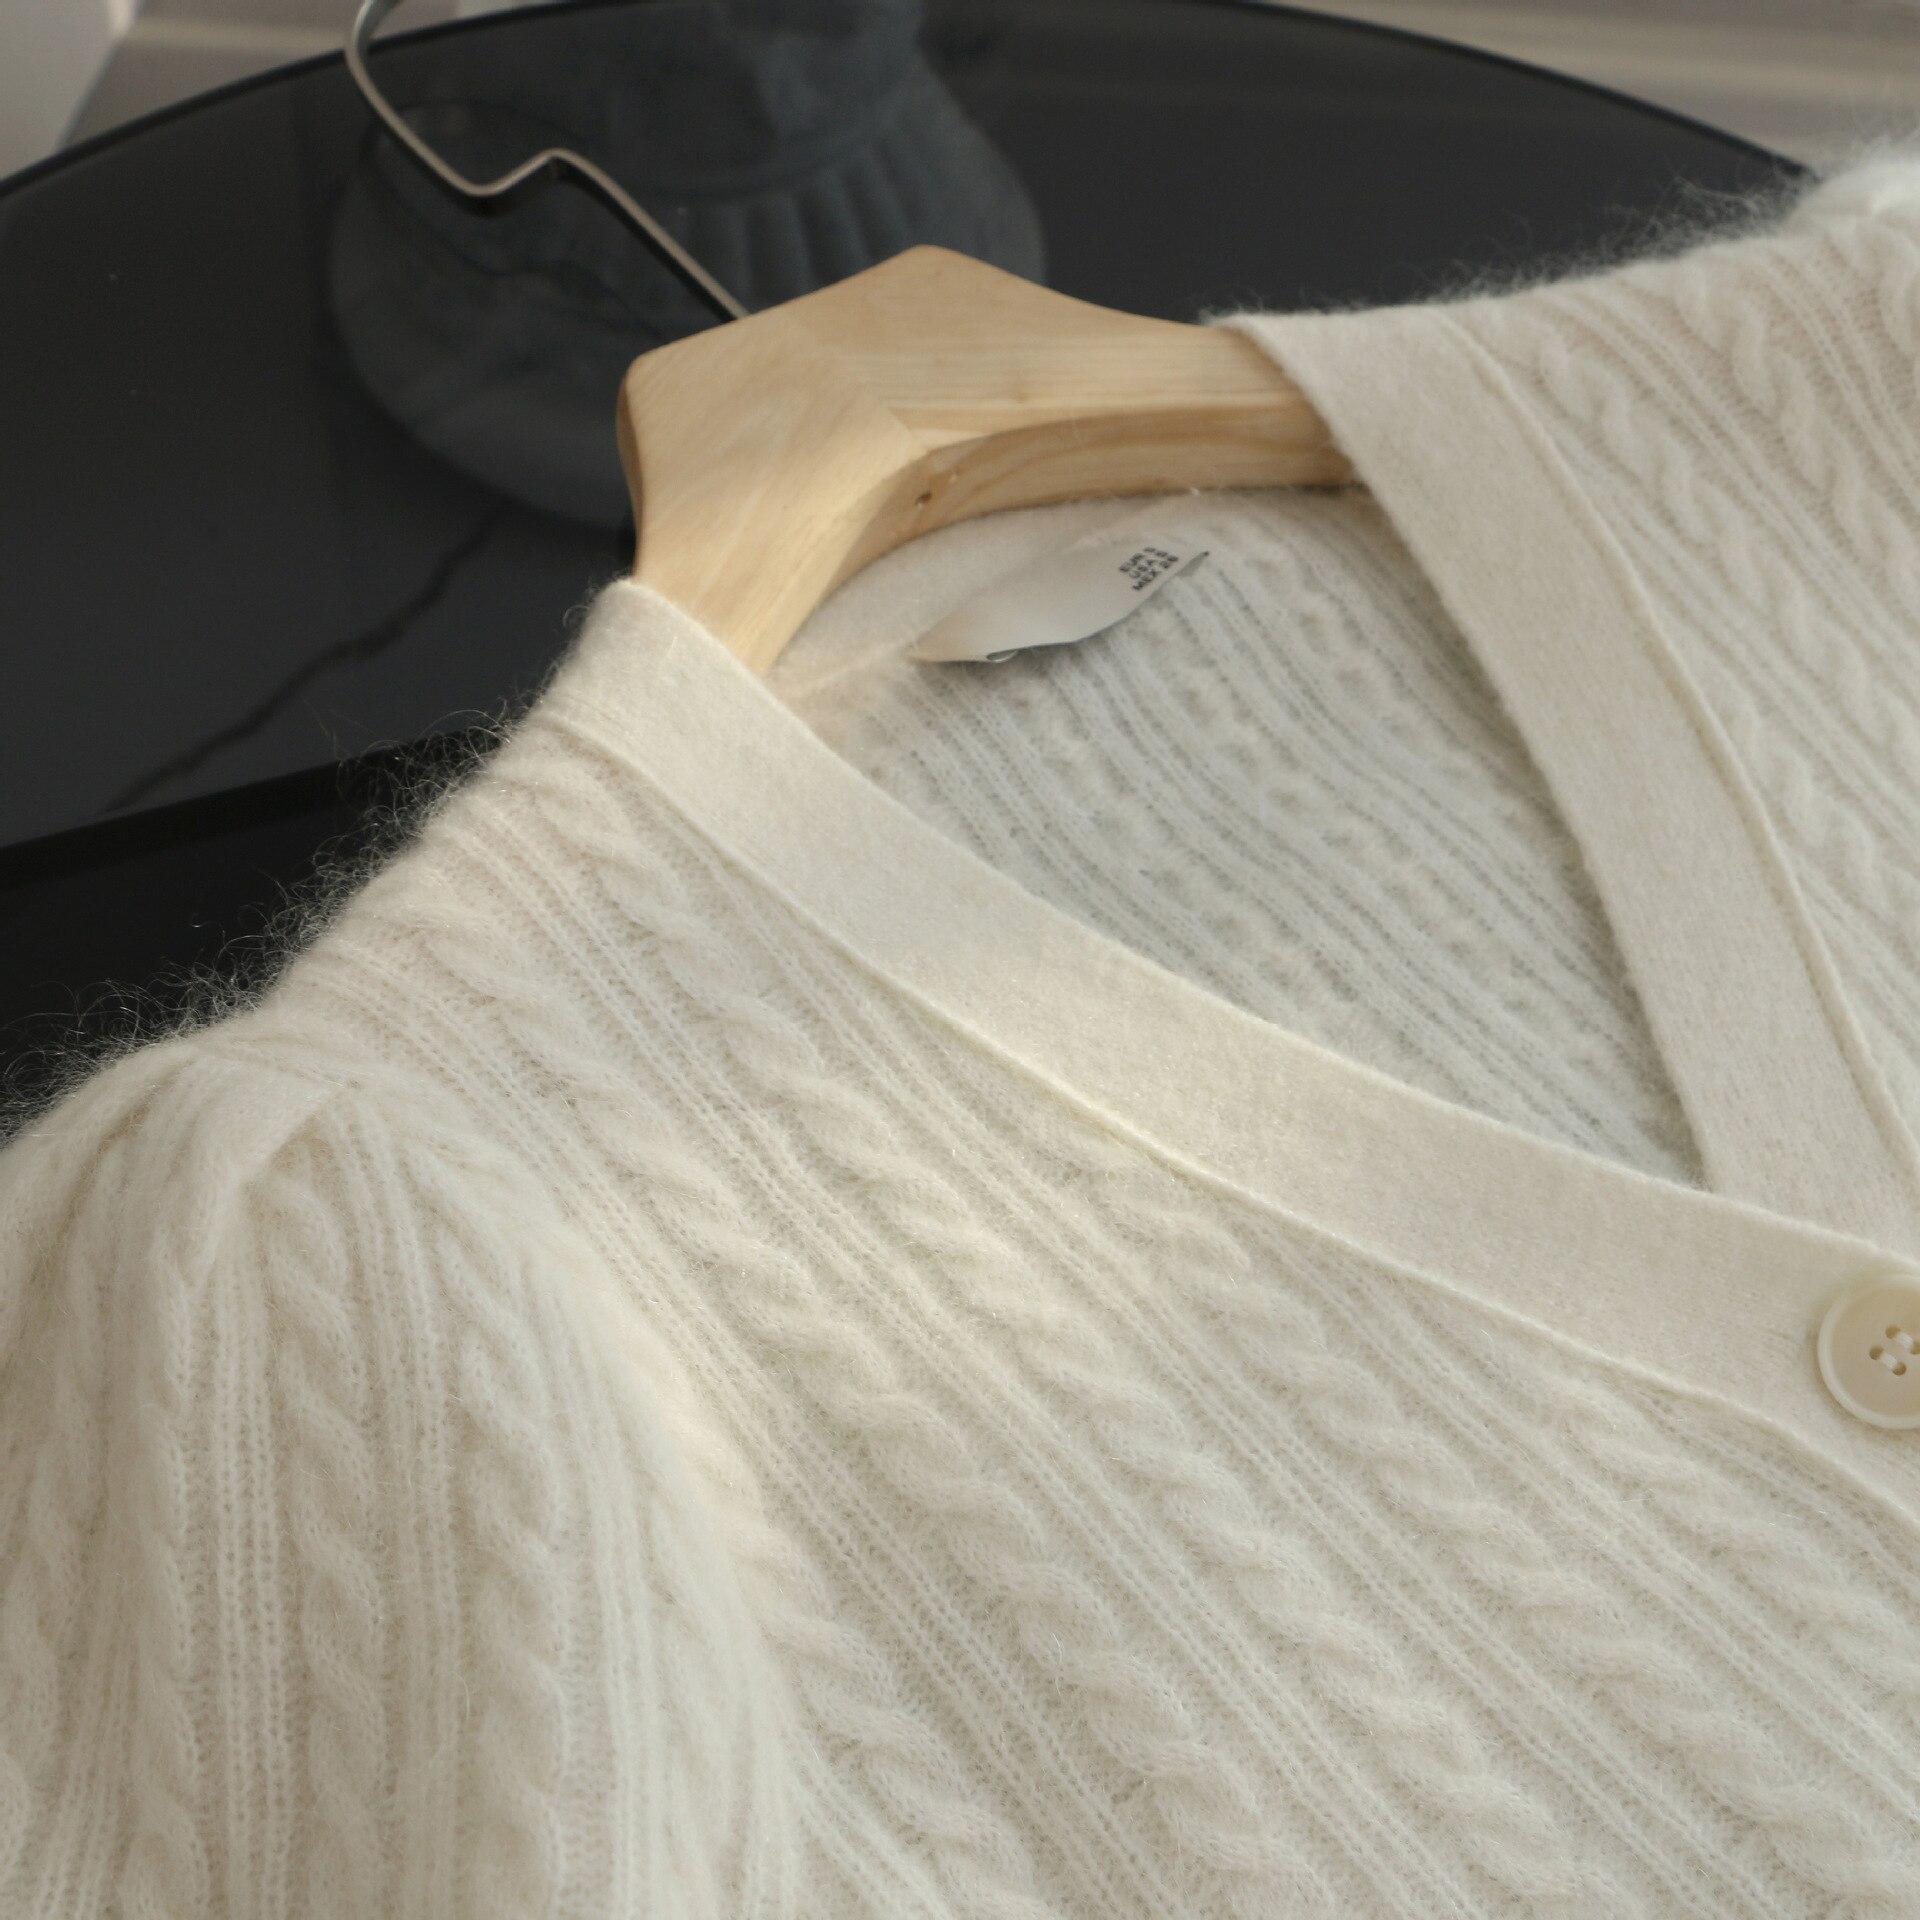 SHUCHAN 35% Mohair Wool Blend SWEATER WOMEN White Puff Sleeve  V-Neck  High Street Crop Tops Cardigan Fashion enlarge